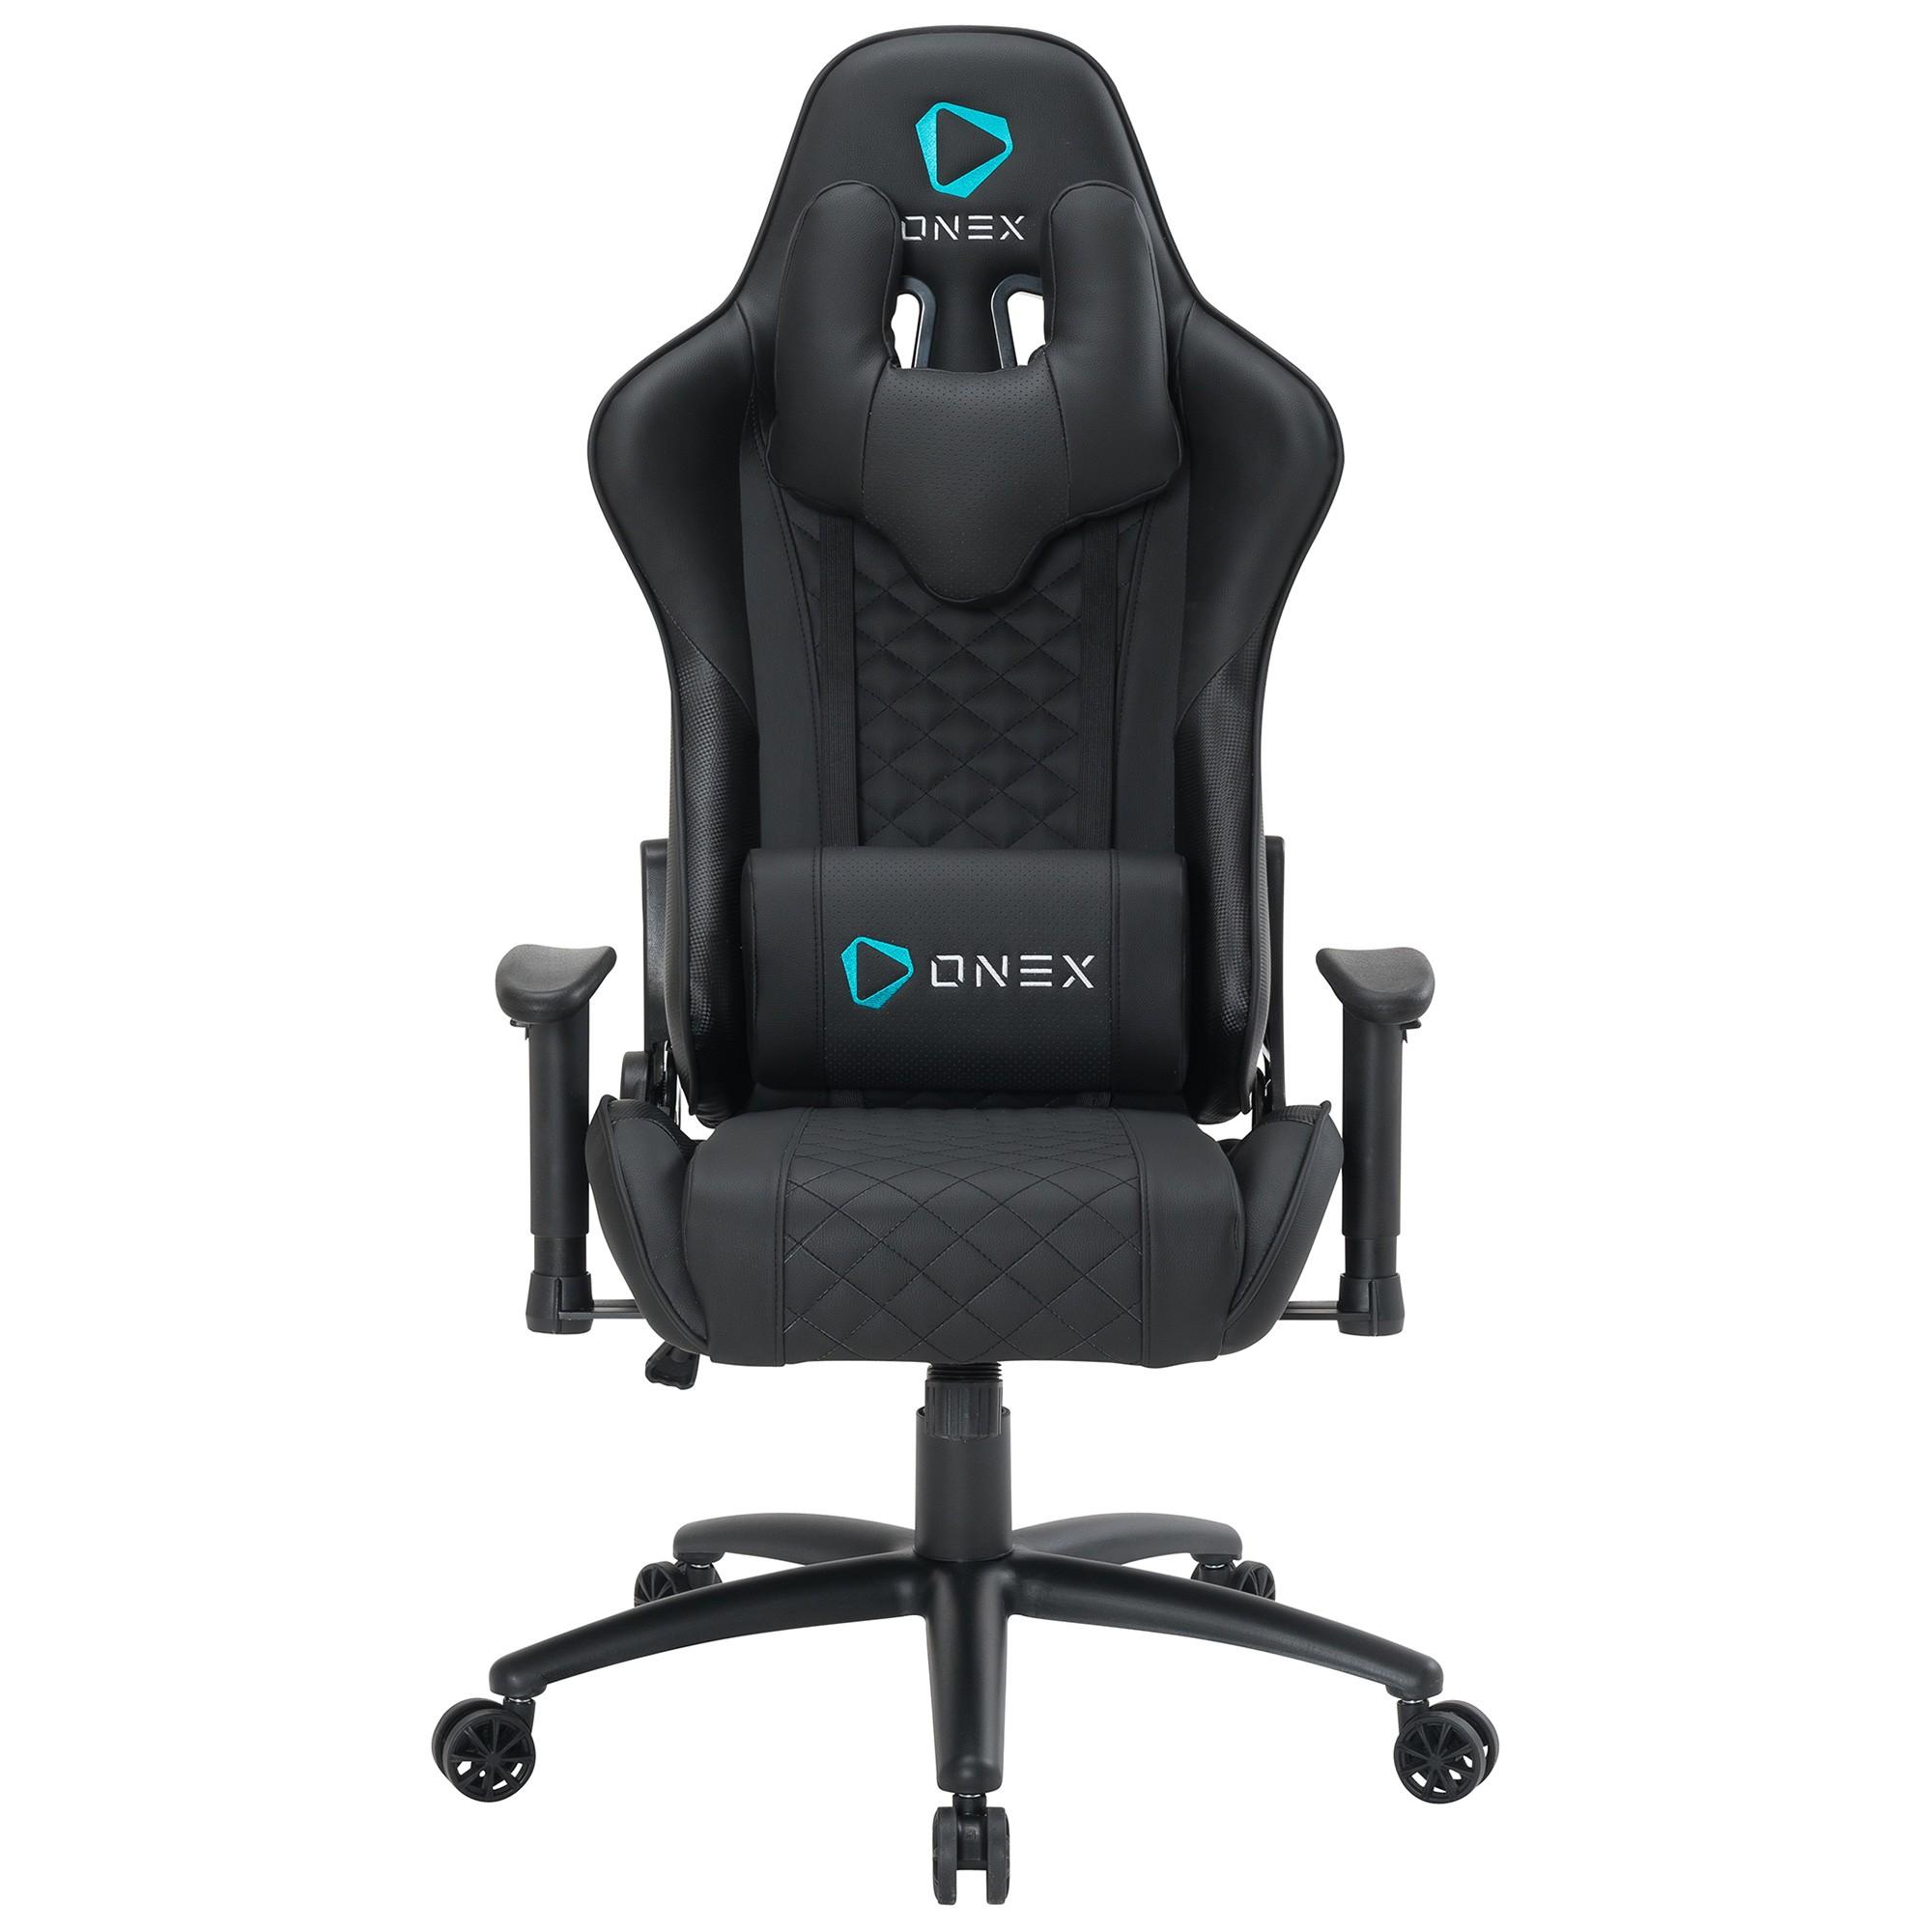 ONEX GX3 Gaming Chair, Black